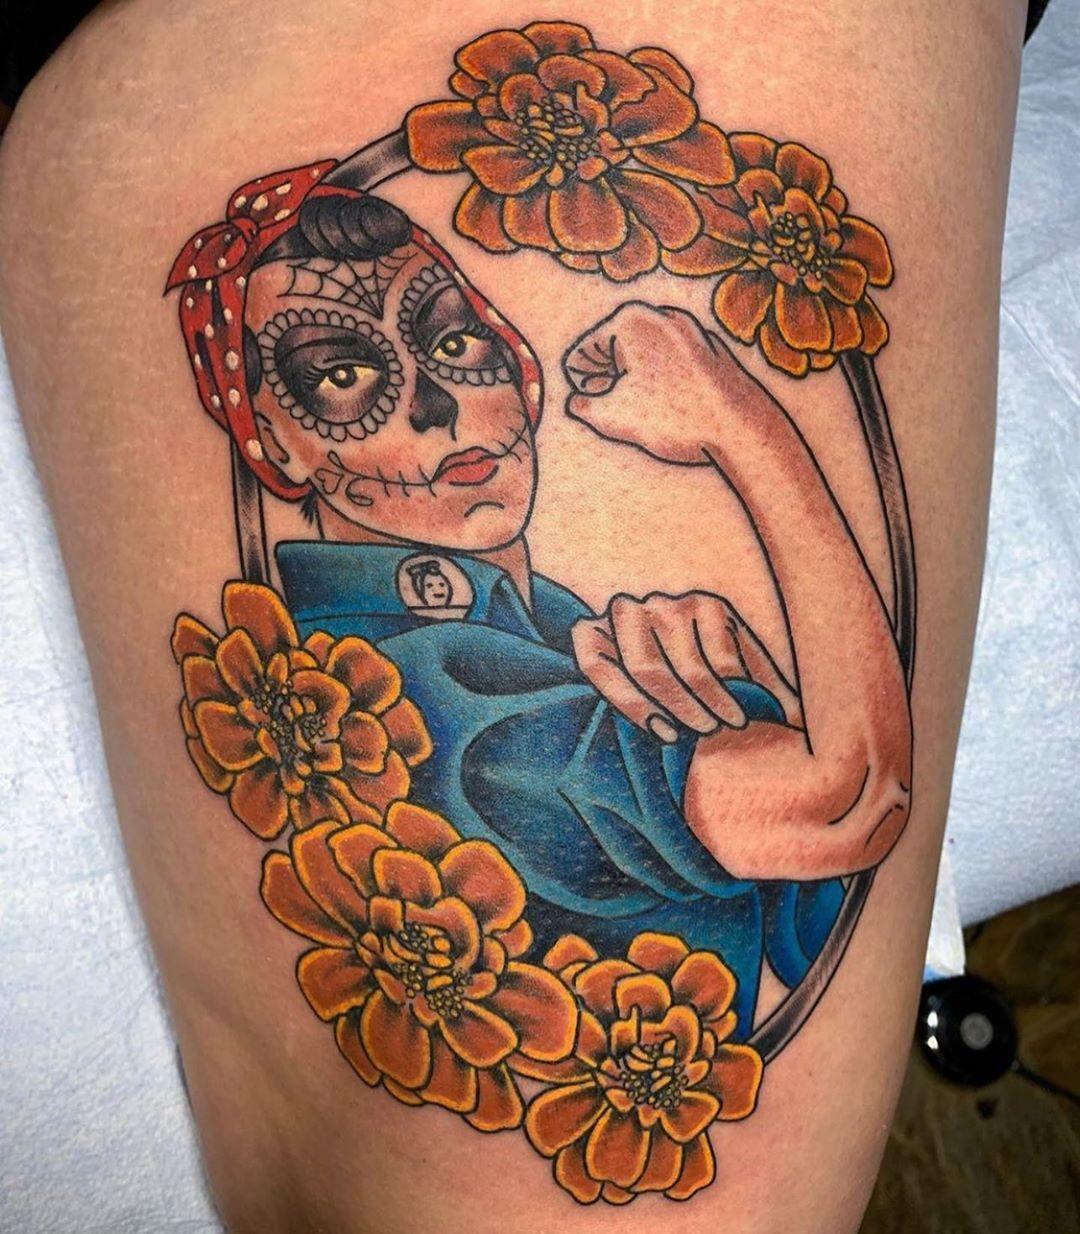 5 Places To Look For A Tattoo  #tattooer #tattooink #tattoolove #tattooshop